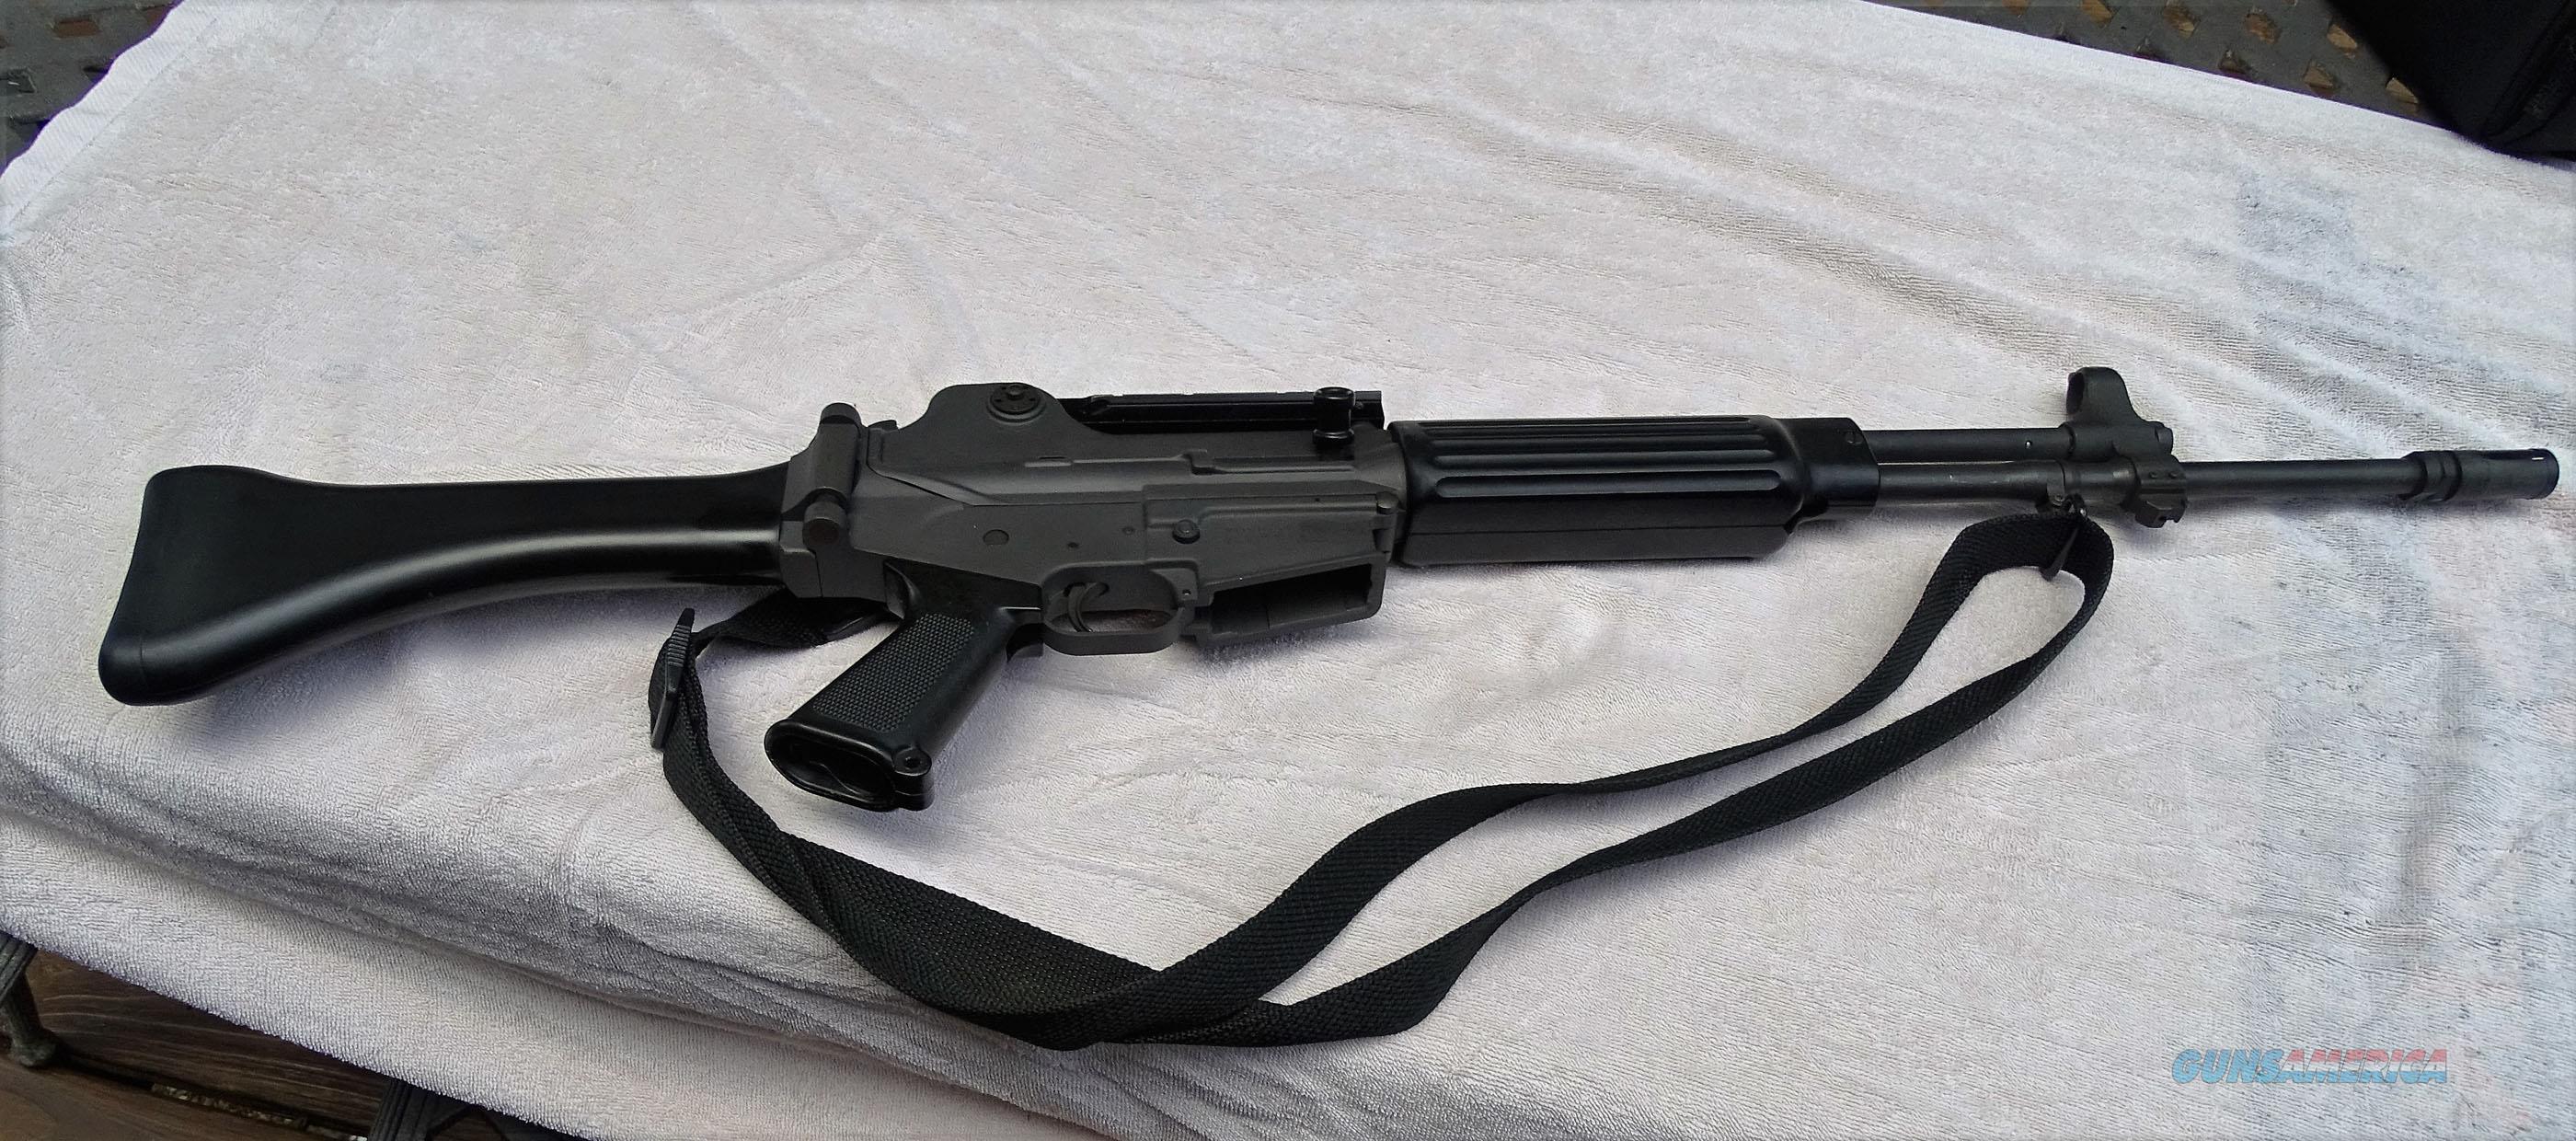 Daewoo AR-100 223/5.56 Rifle AR15/AK47/FNFAL Fe... for sale